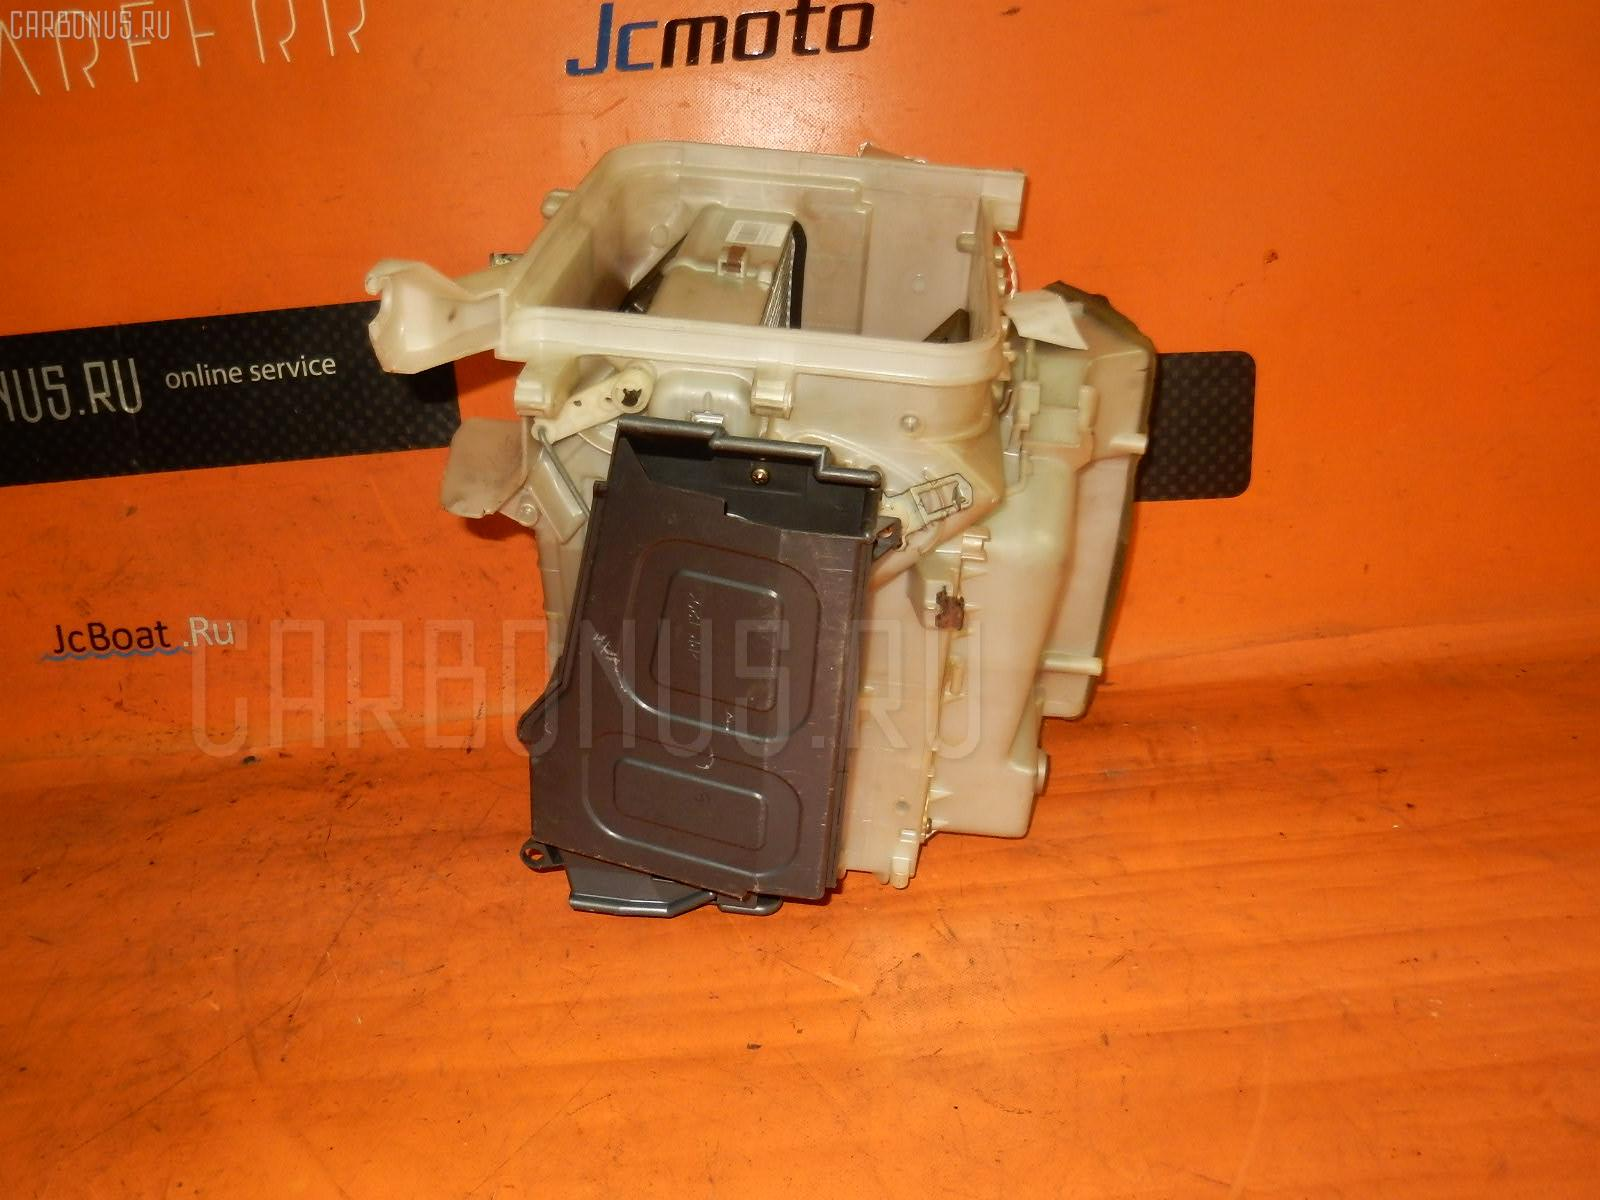 Радиатор печки TOYOTA COROLLA WAGON EE102V 4E-FE. Фото 2